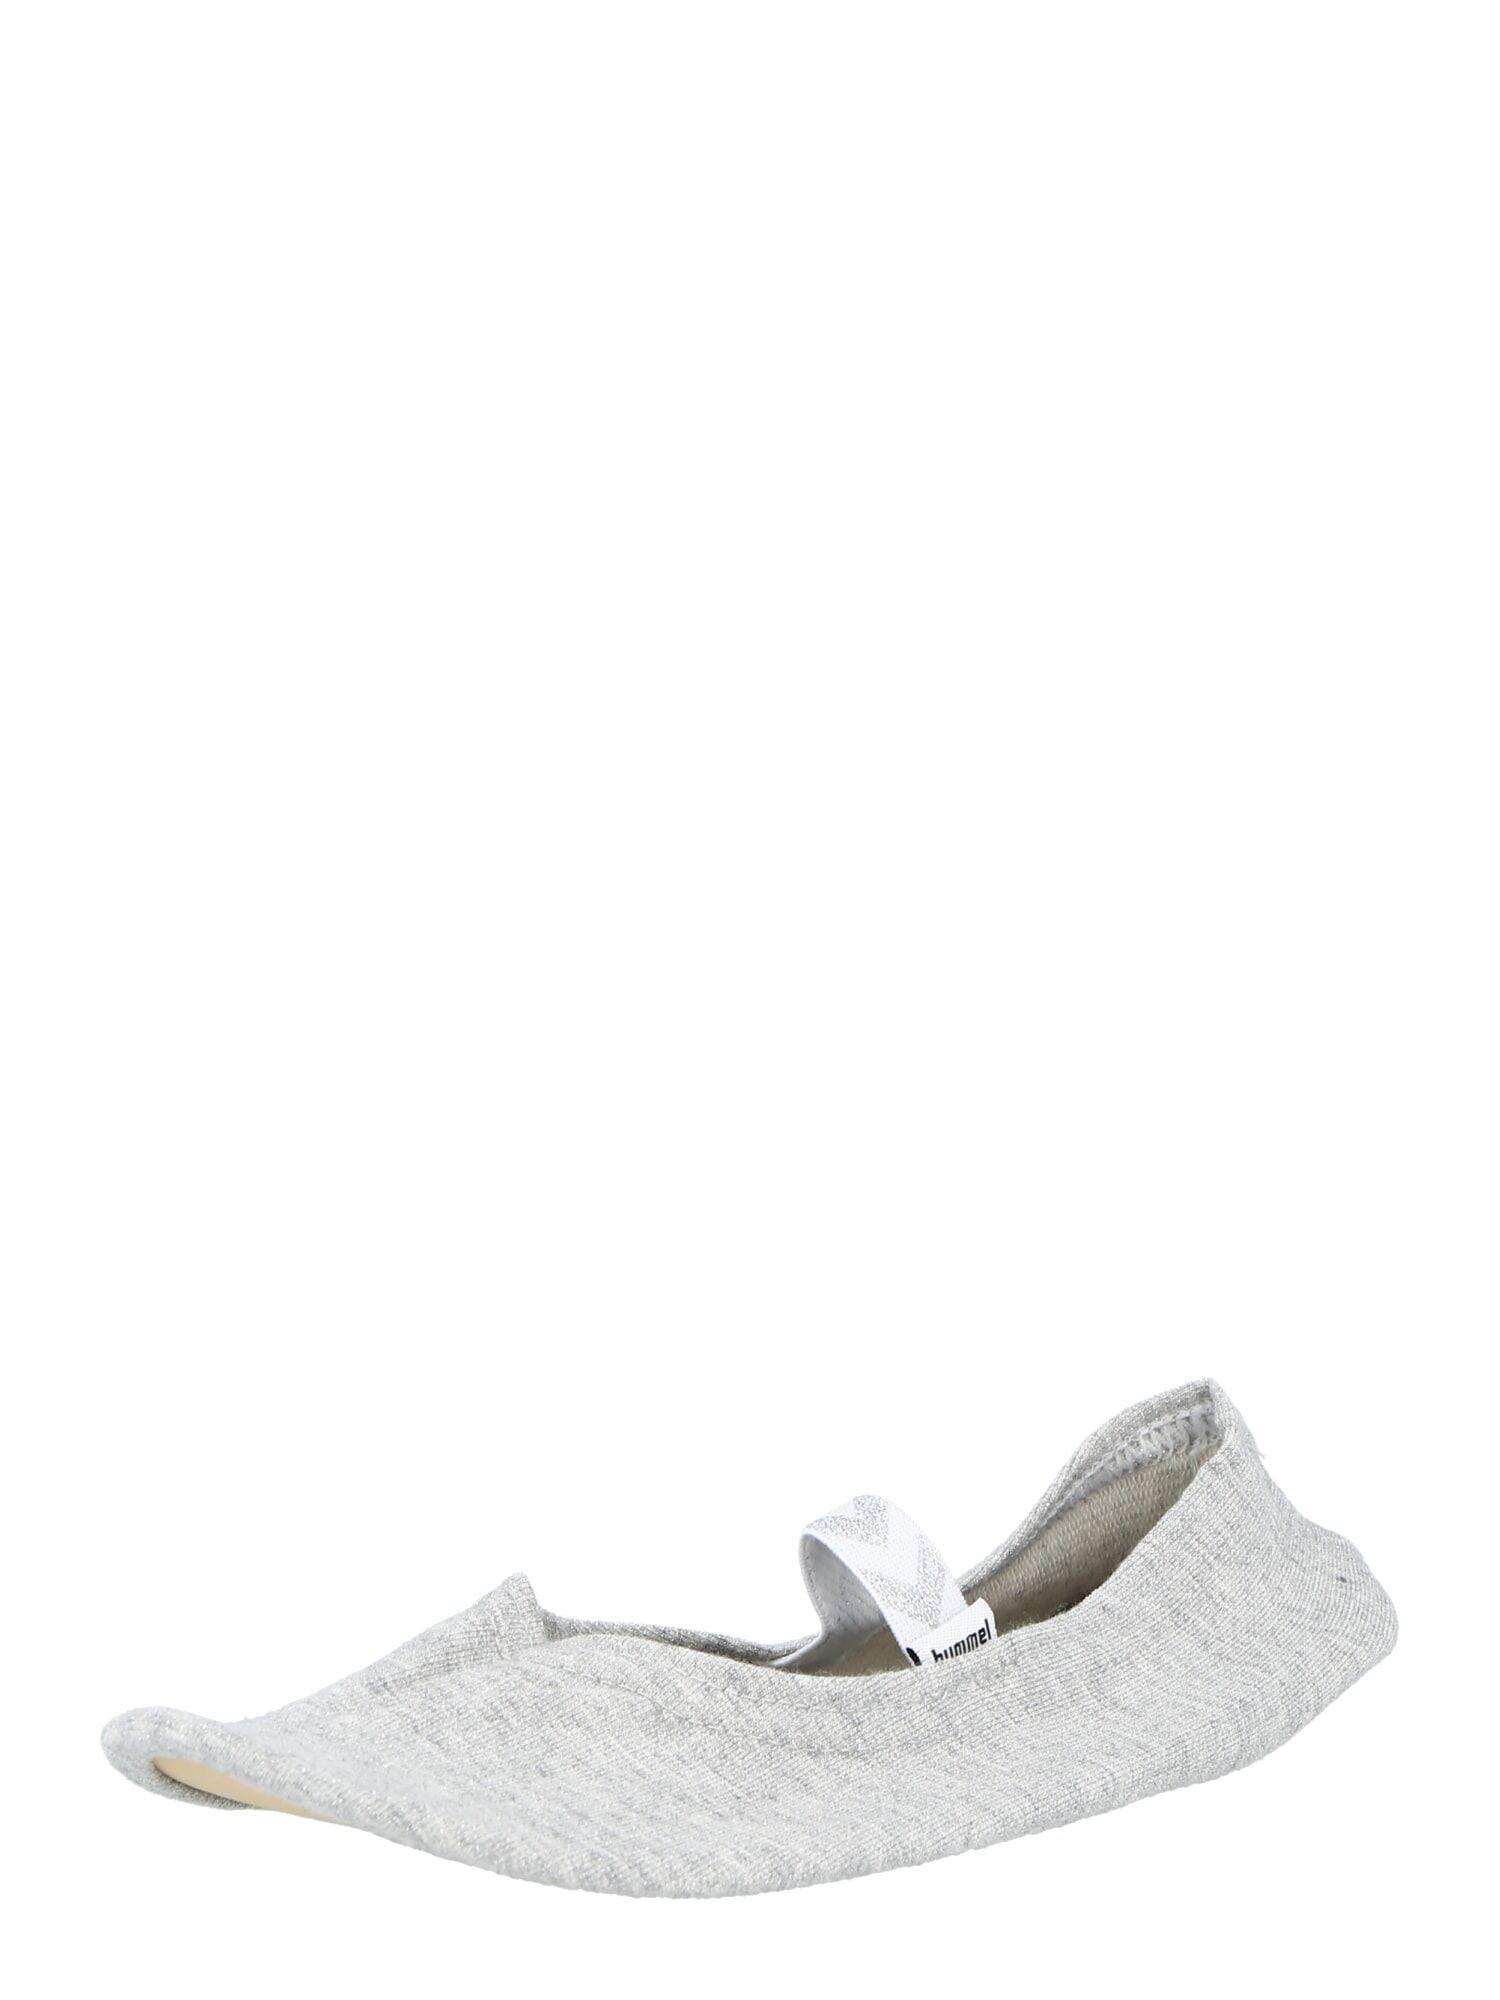 Hummel Chaussure de sport  - Gris - Taille: 23 - boy